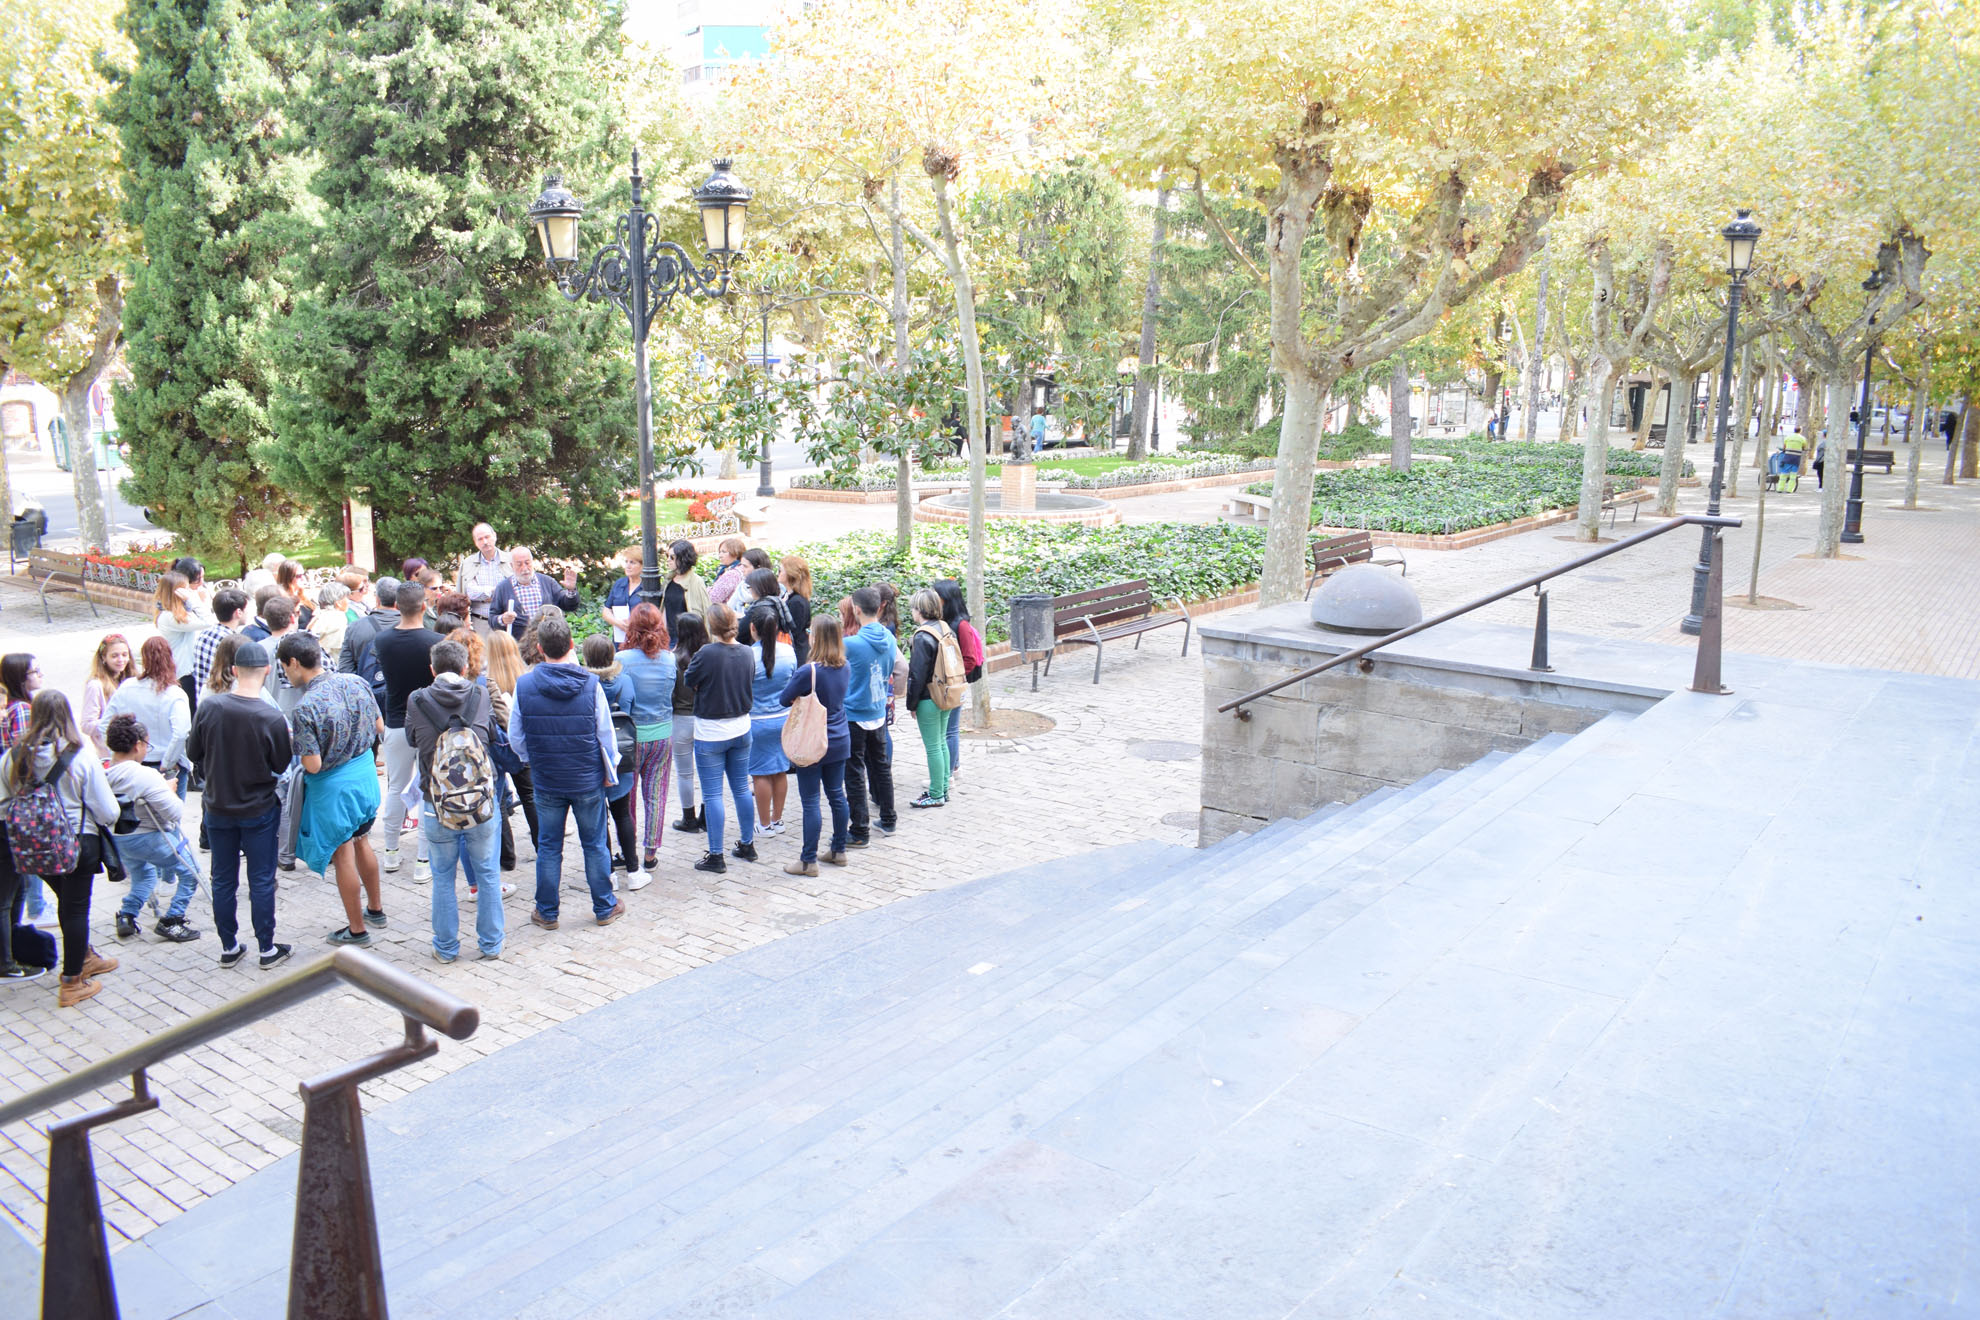 SEMANA-ARQUITECTURA-COAR-FCAR-paseo-espolon-glorieta-plaza-ayuntamiento-jose-miguel-leon (17)